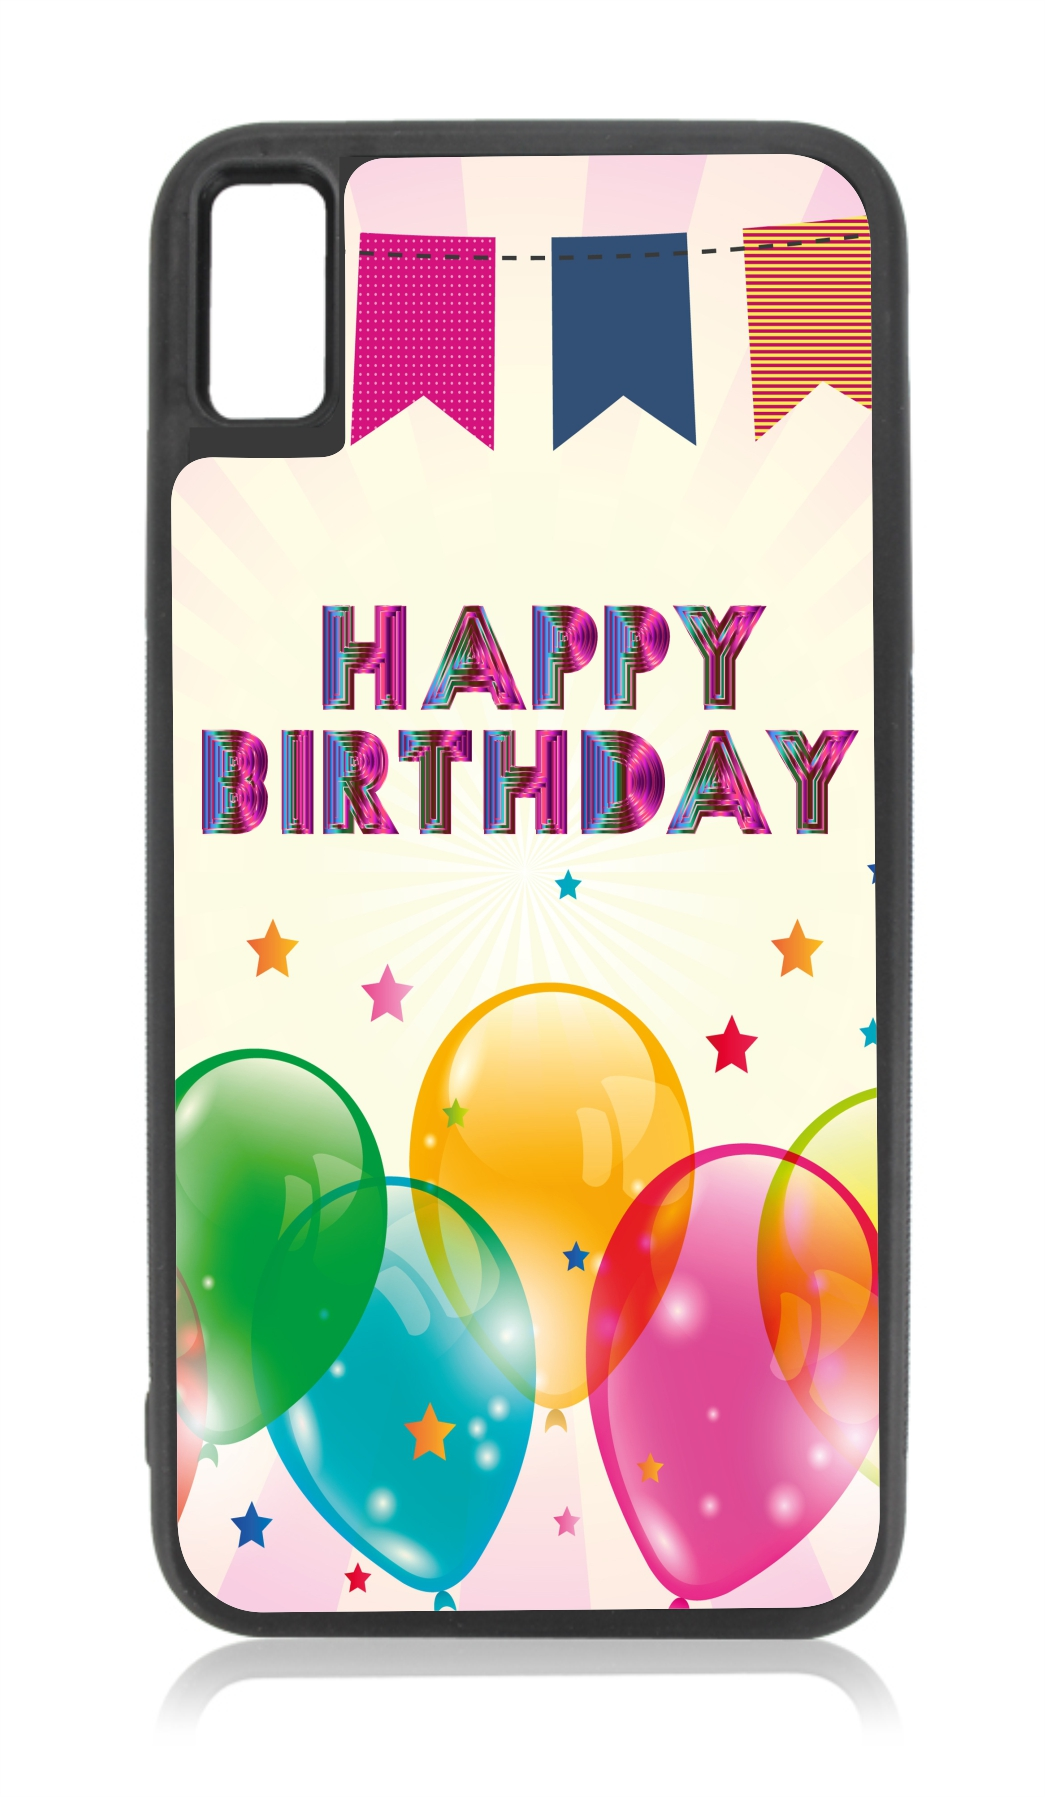 Happy Birthday Balloons Design Compatible With Iphone 11 Case Black Tpu Walmart Com Walmart Com